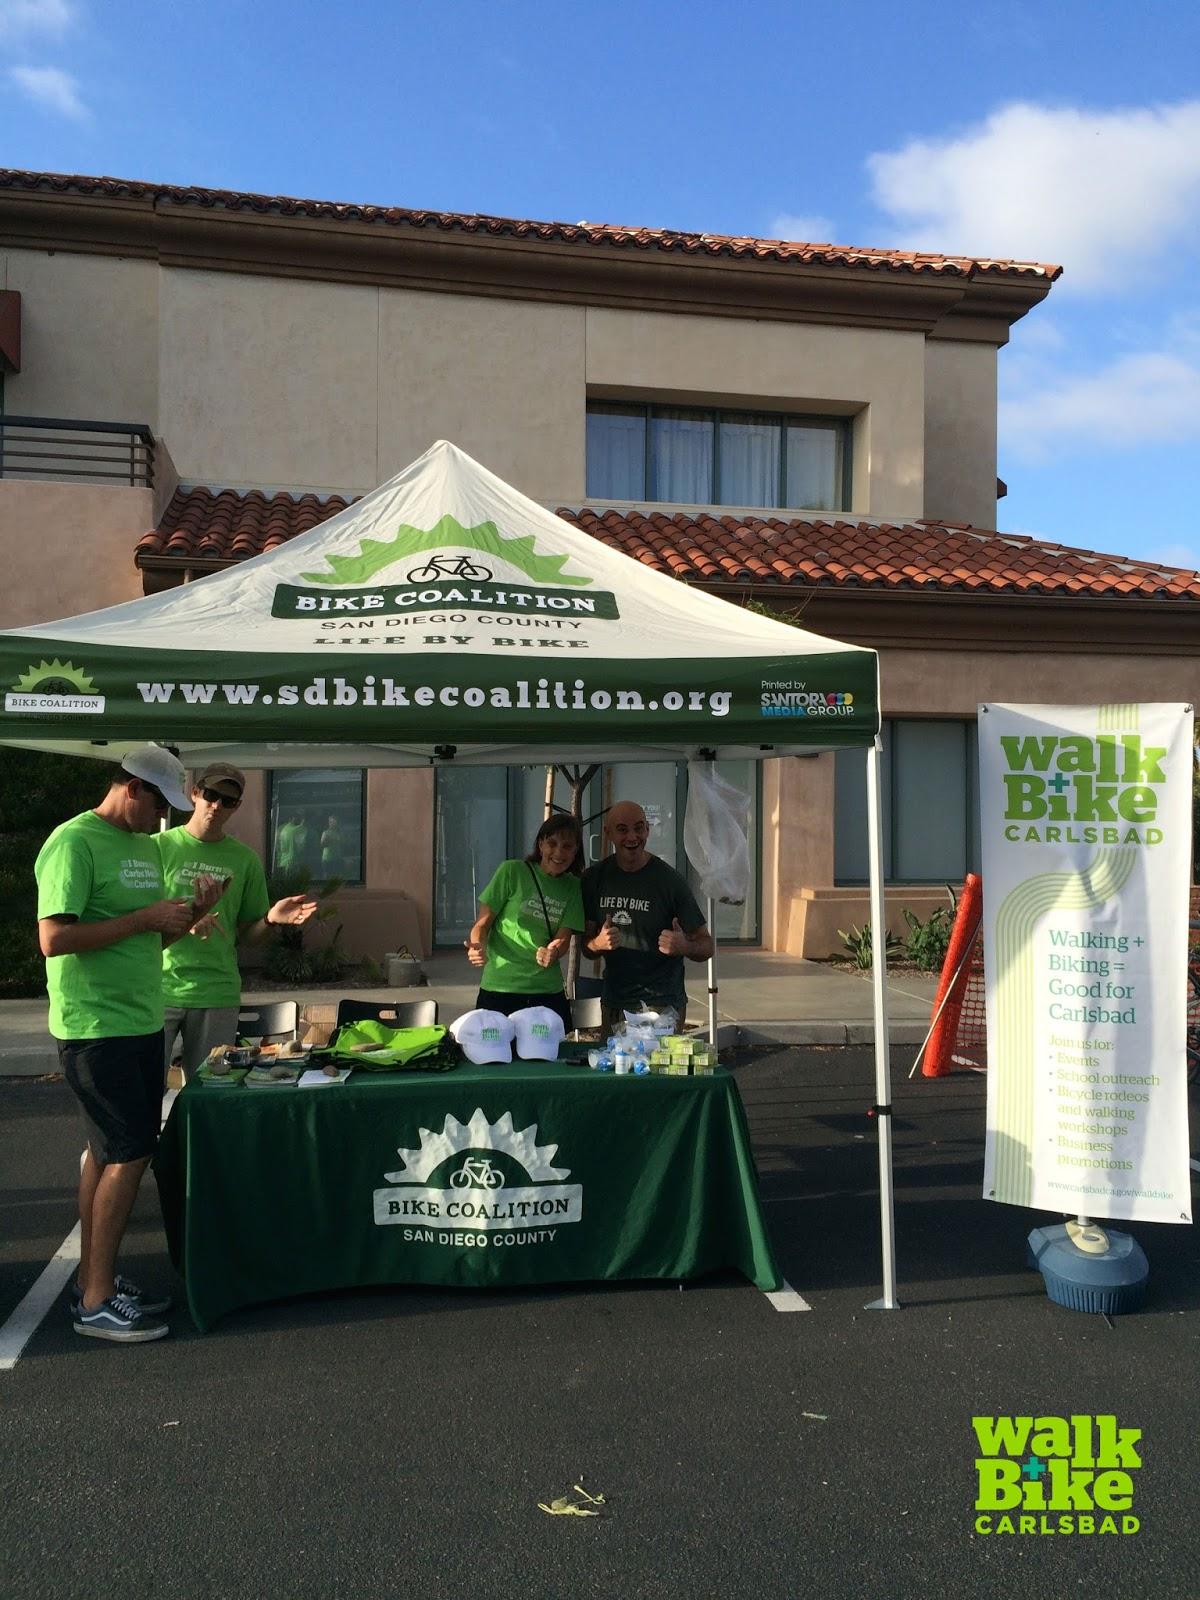 Bicycle Warehouse - Kearny Mesa - San Diego, CA - Yelp